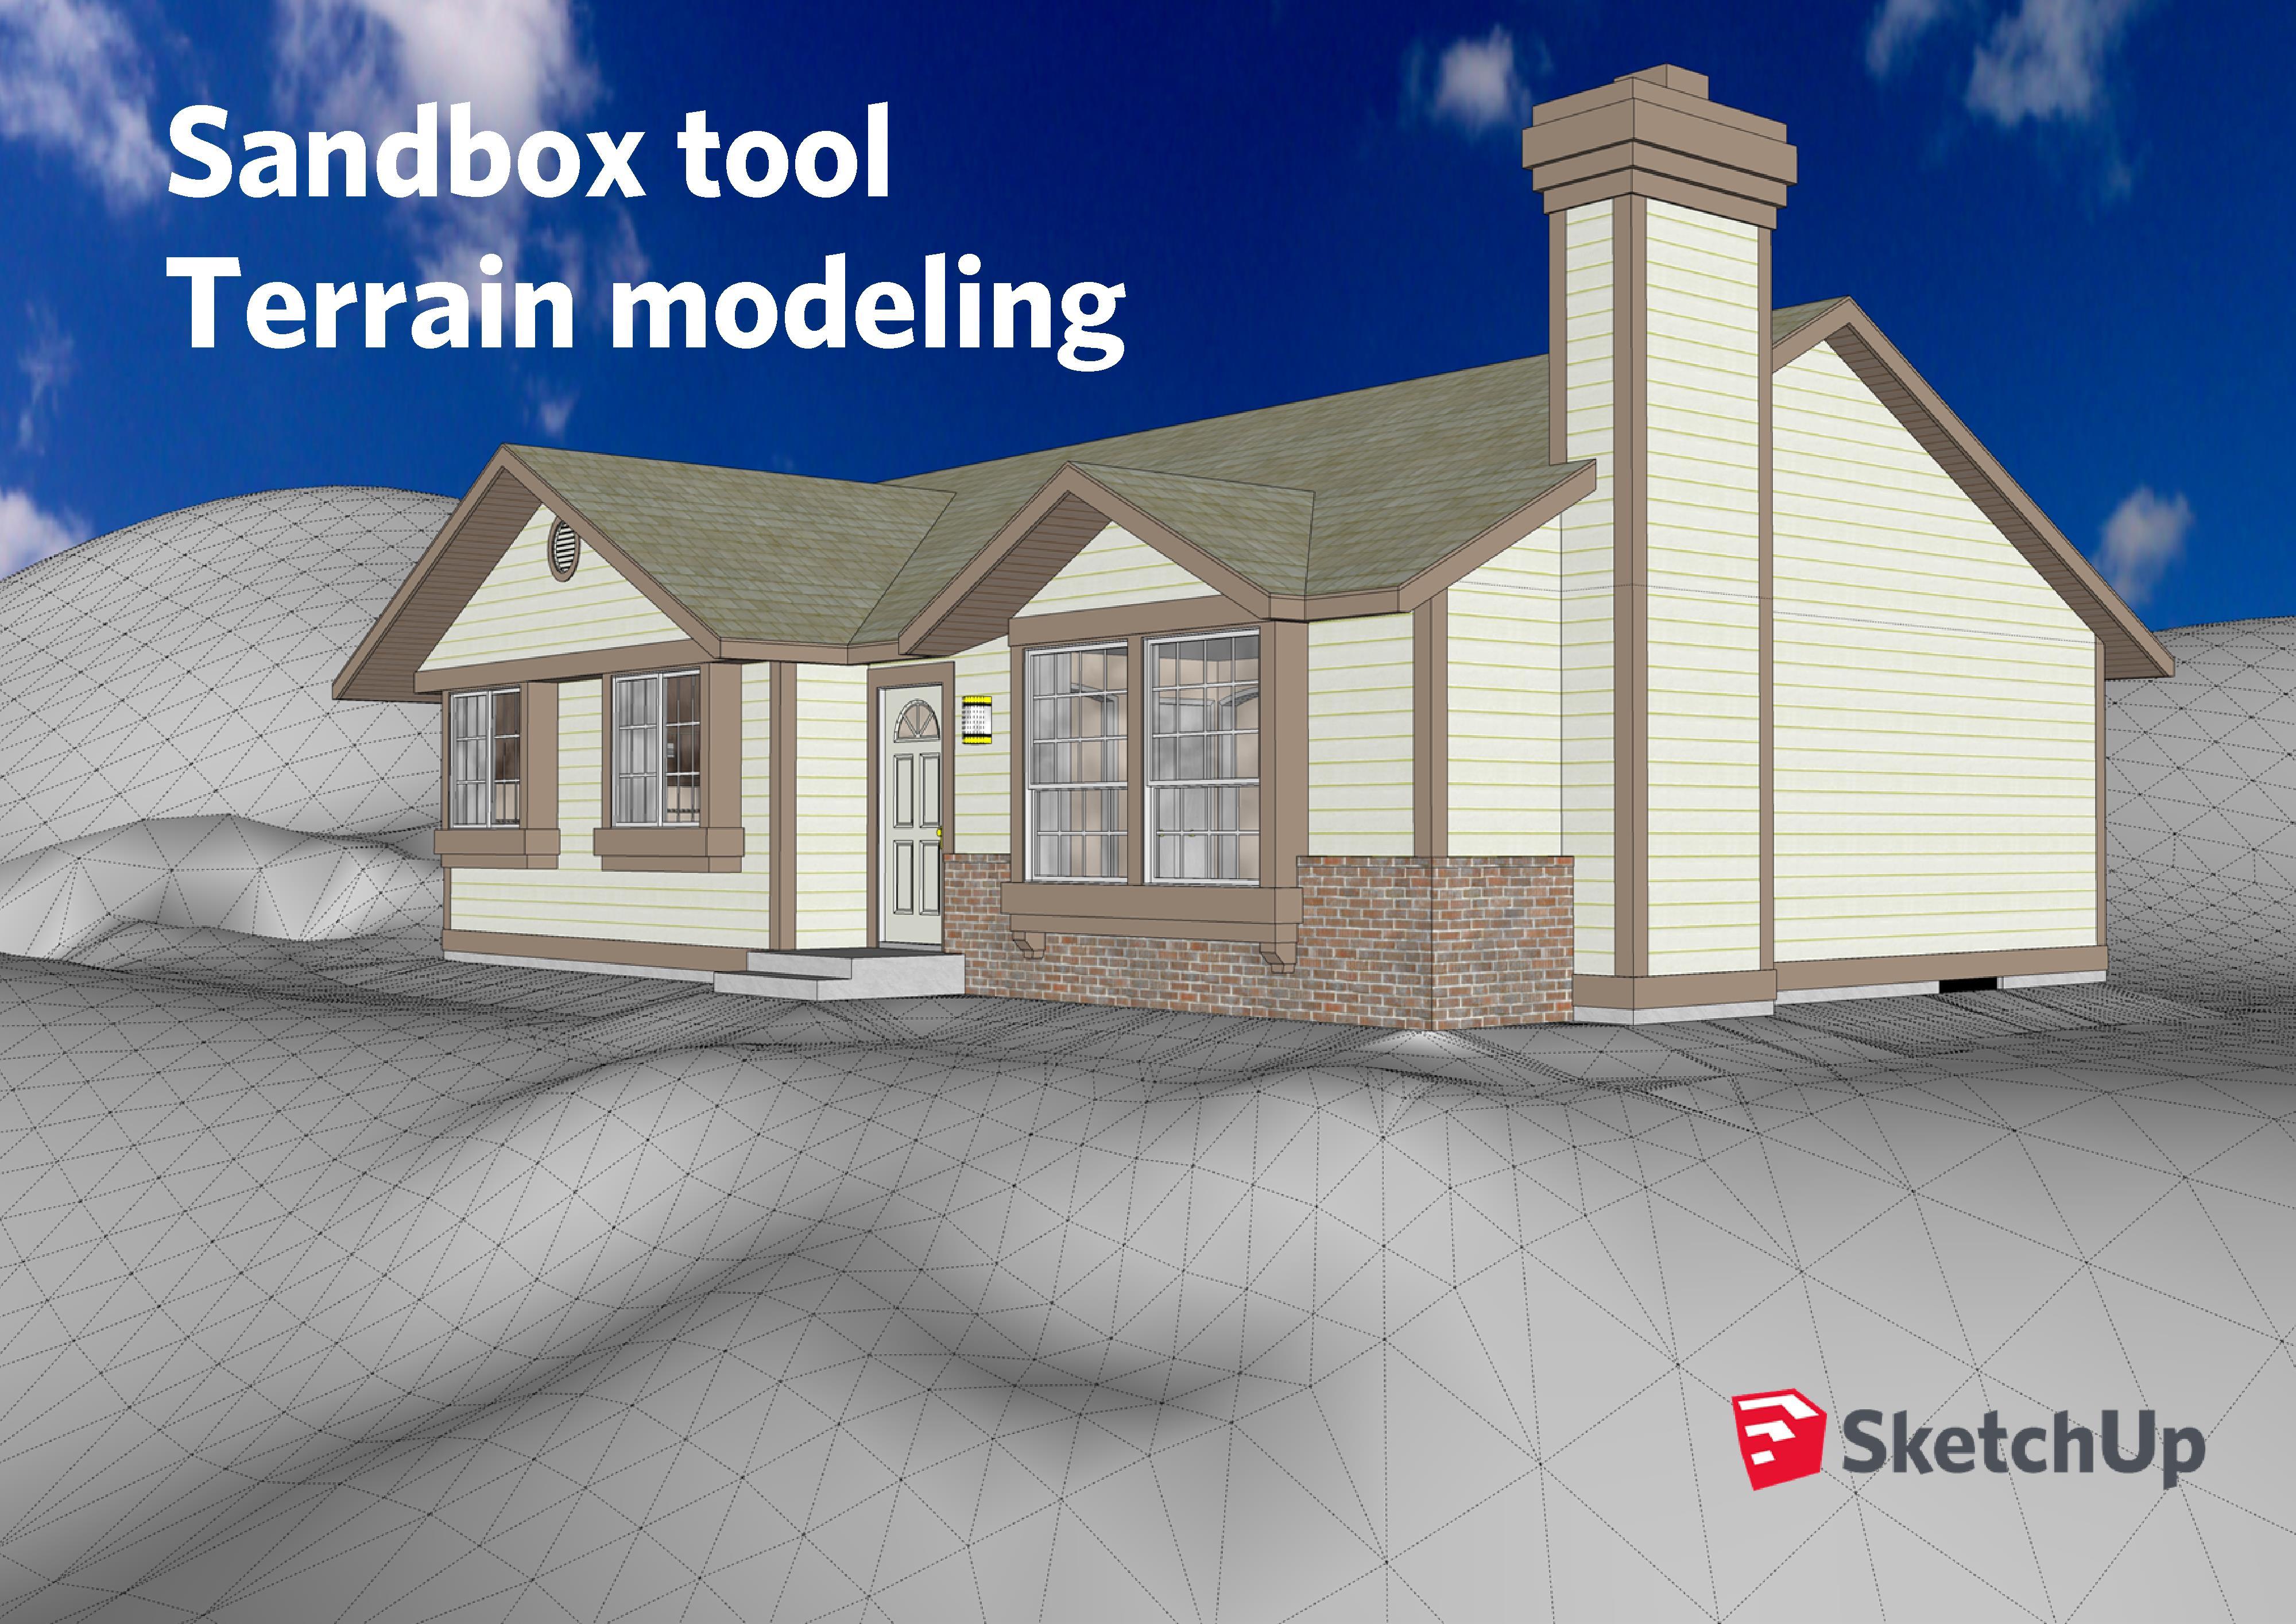 Sandbox tool for SketchUp